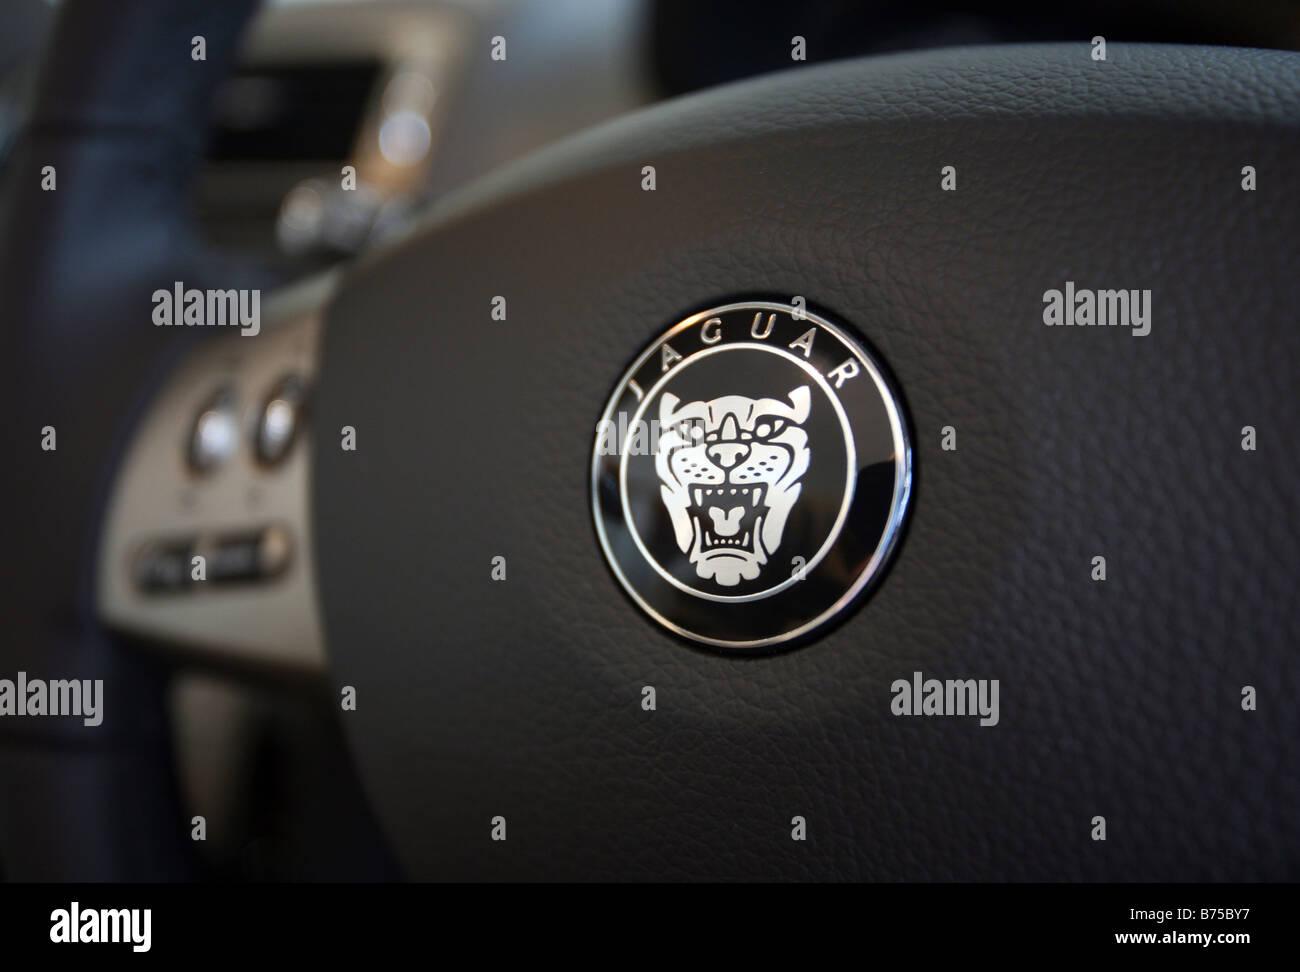 Jaguar Badge On A Car Steering Wheel Stock Photo 21632107 Alamy